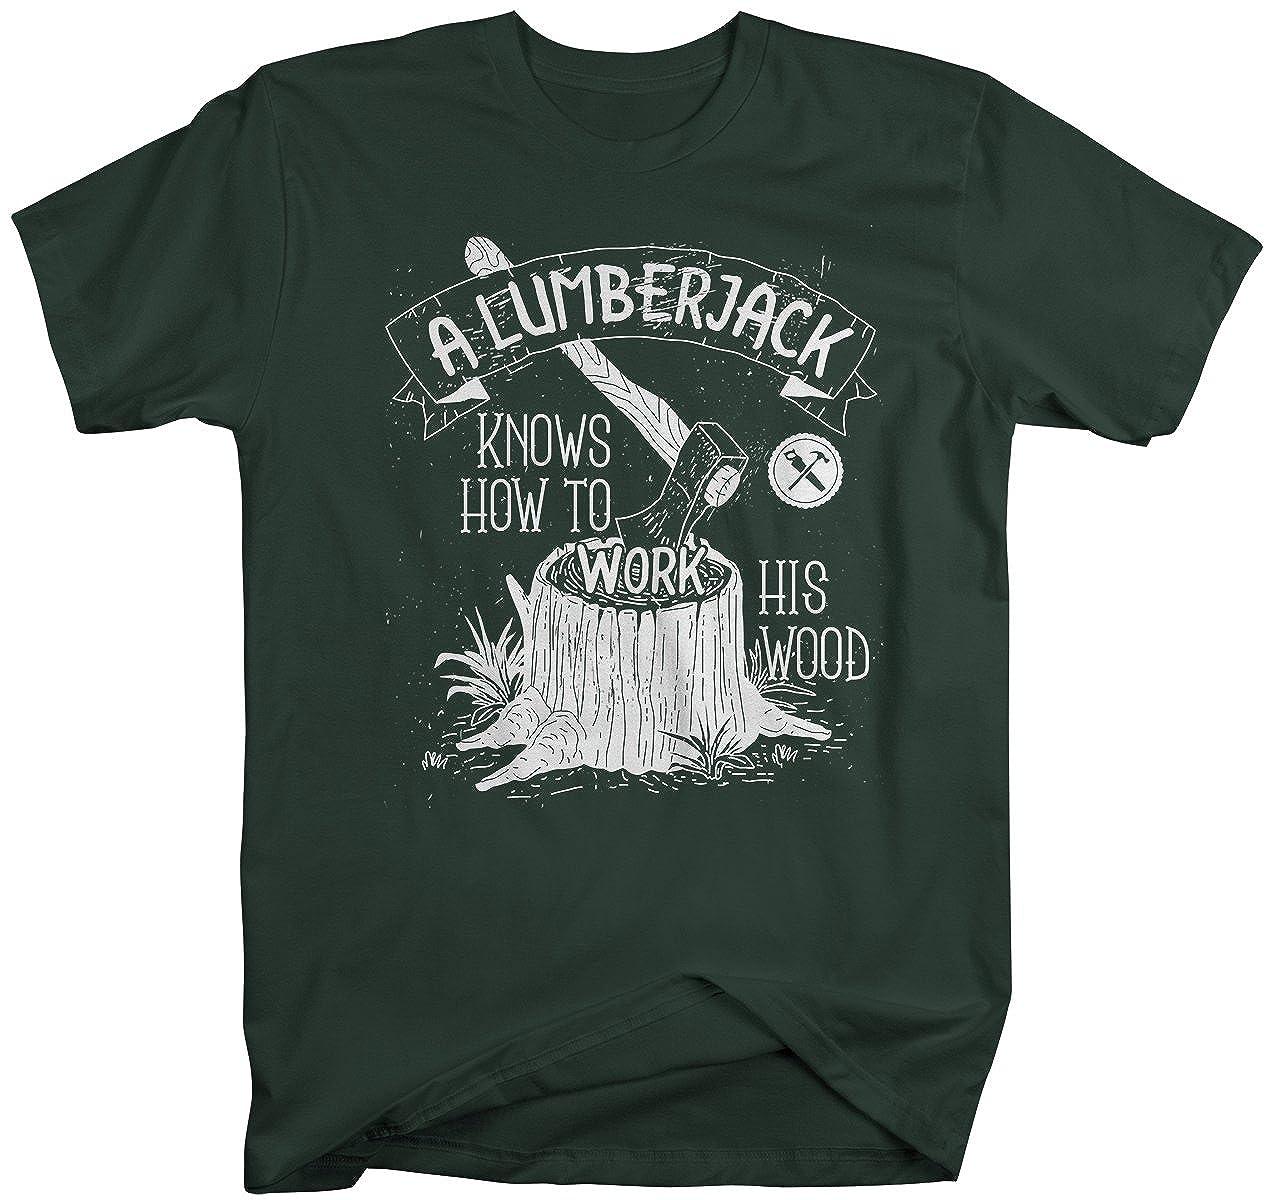 92c25f8143 Amazon.com: Shirts By Sarah Men's Funny Lumberjack T-Shirt Work His Wood Logging  Tee Shirt: Clothing